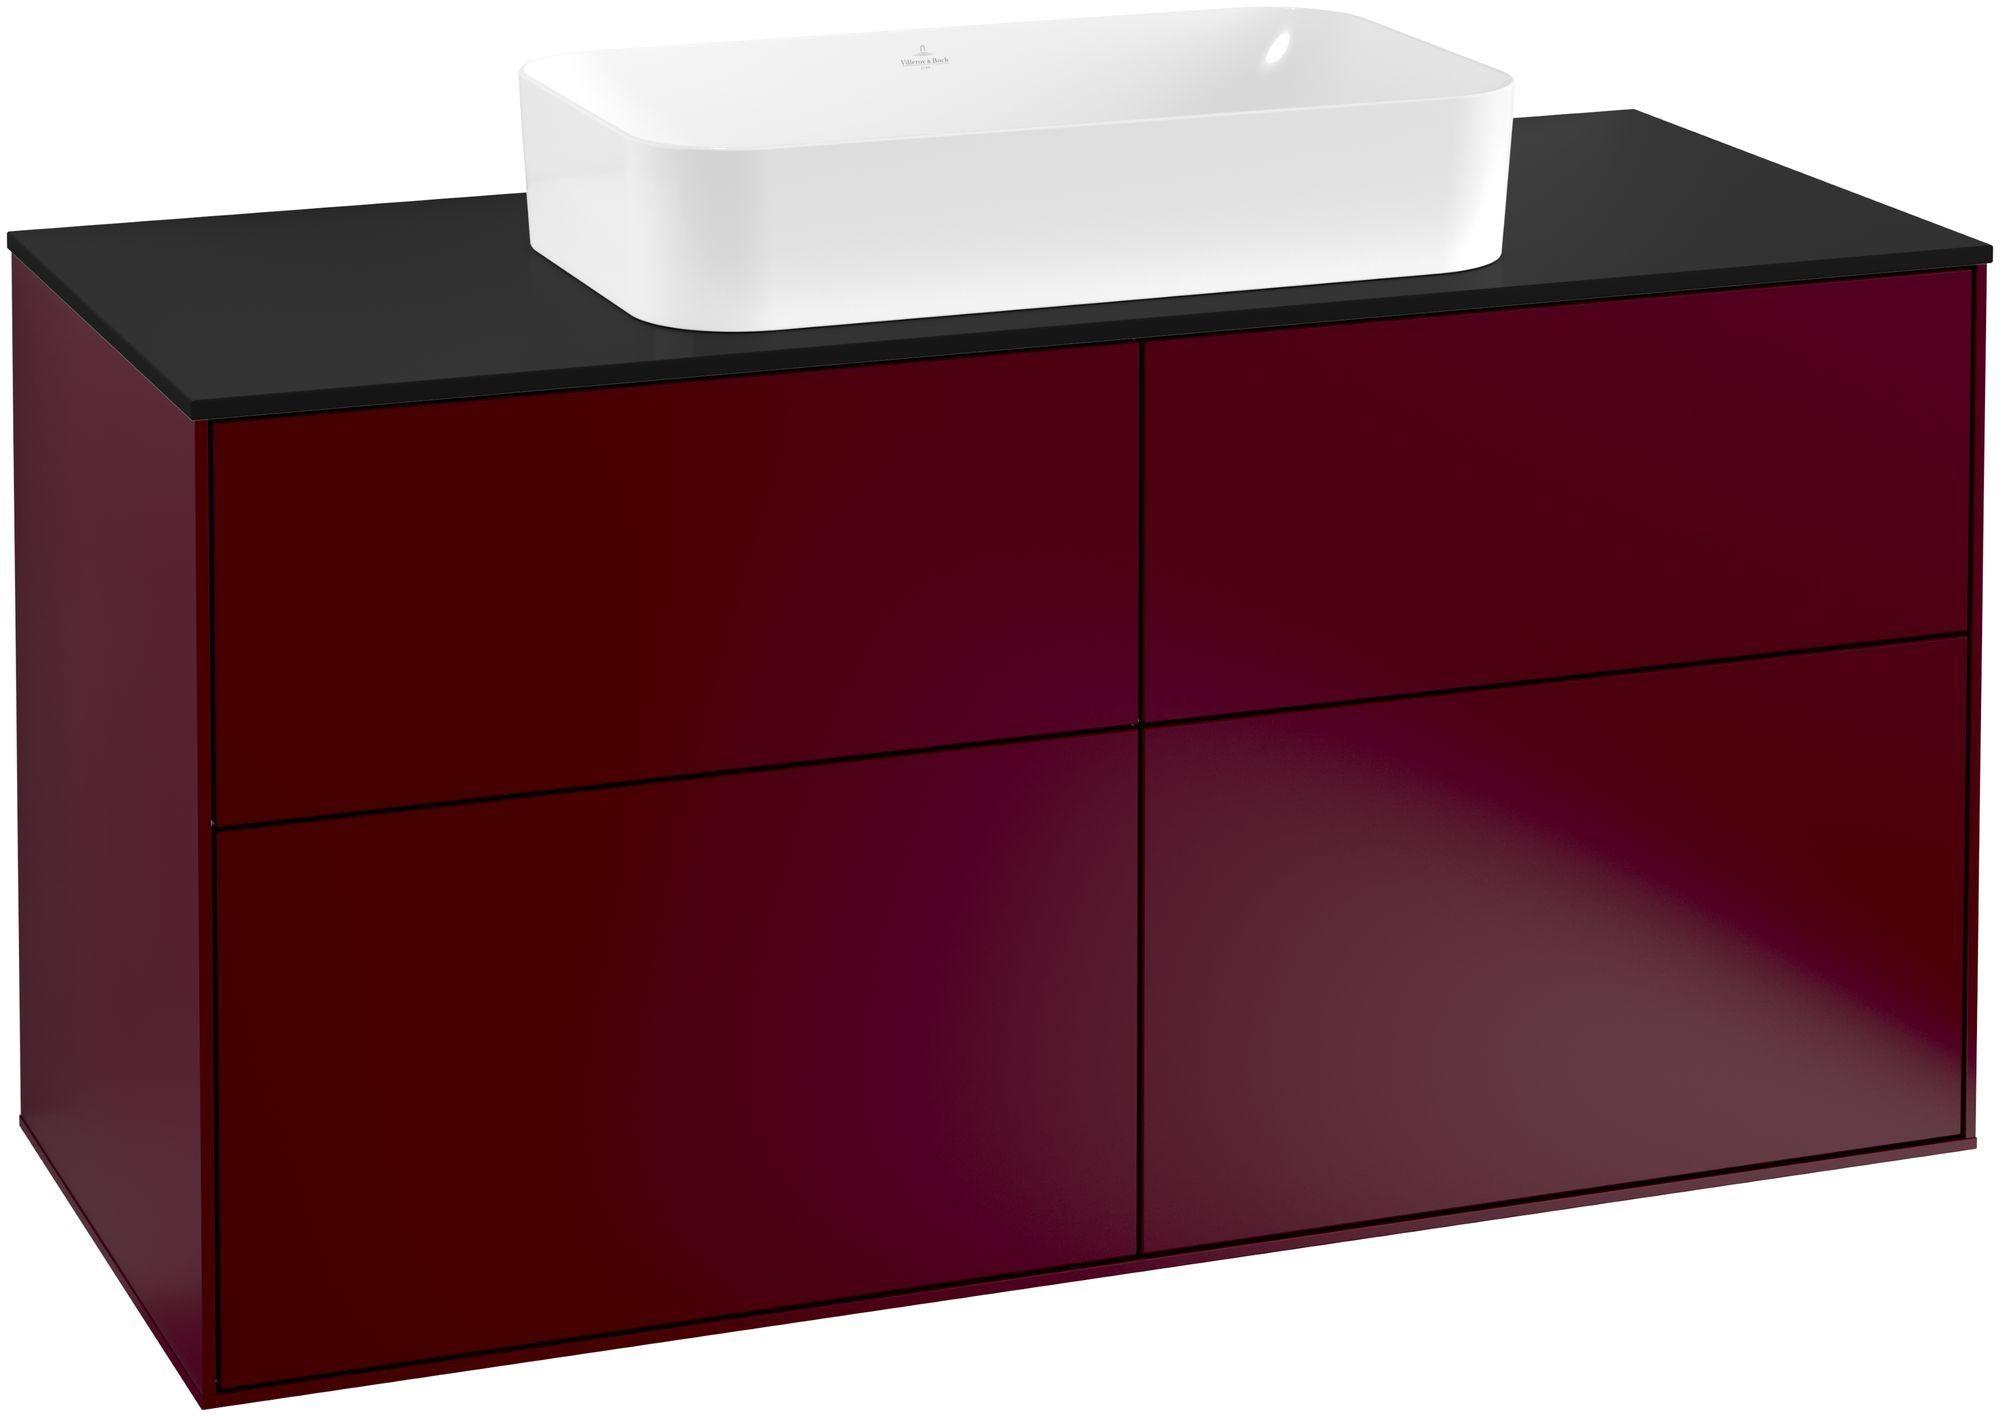 Villeroy & Boch Finion G26 Waschtischunterschrank 4 Auszüge Waschtisch mittig LED-Beleuchtung B:120xH:60,3xT:50,1cm Front, Korpus: Peony, Glasplatte: Black Matt G26200HB